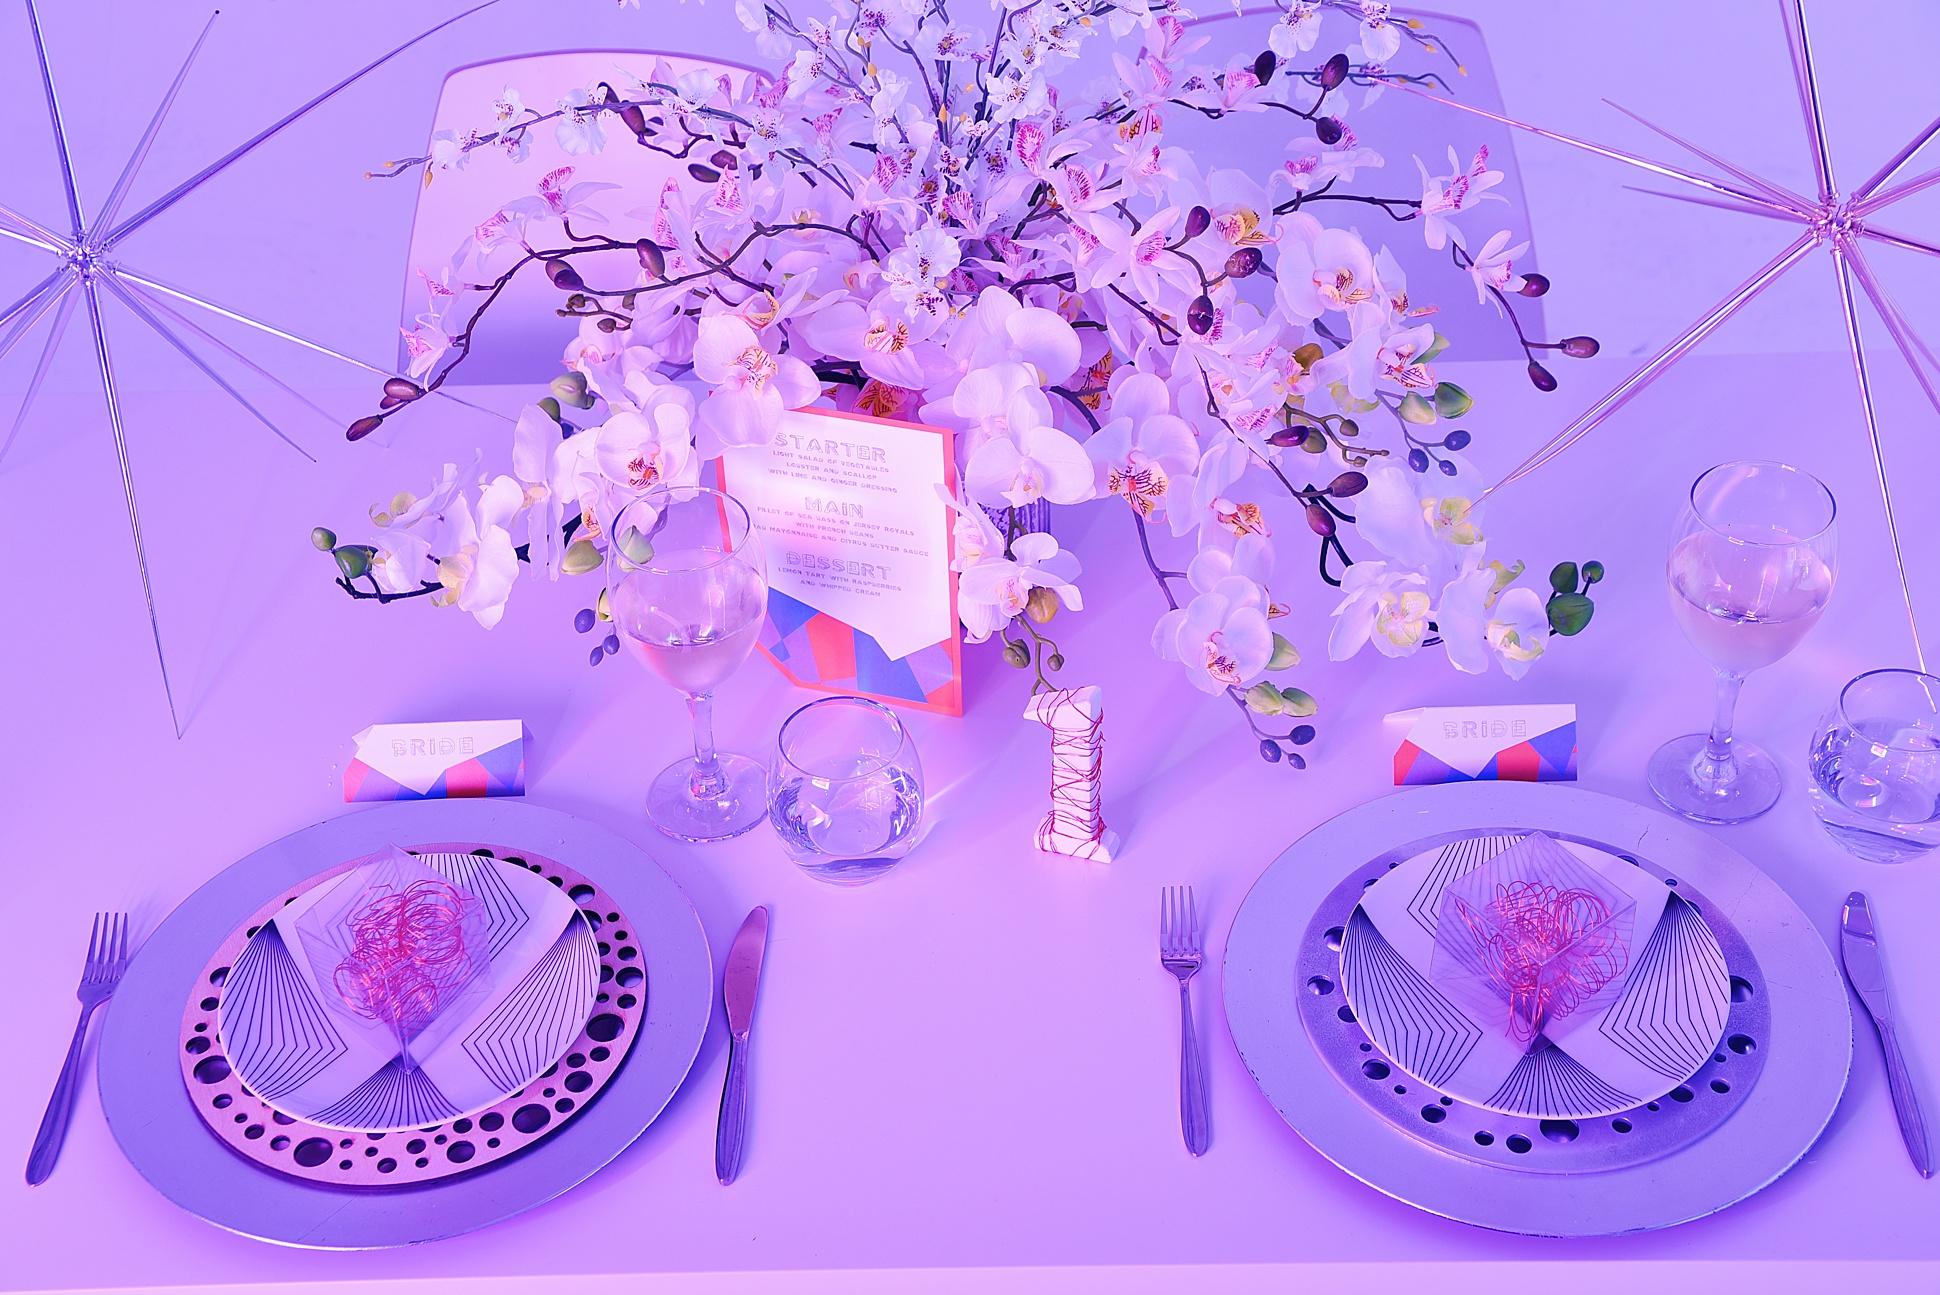 Icetank, futuristic fantasy, same sex brides / Photos by Emma Jane Photography / Styled by Way Out Wedding & Carmela Weddings / As featured on www.mrandmrsunique.co.uk